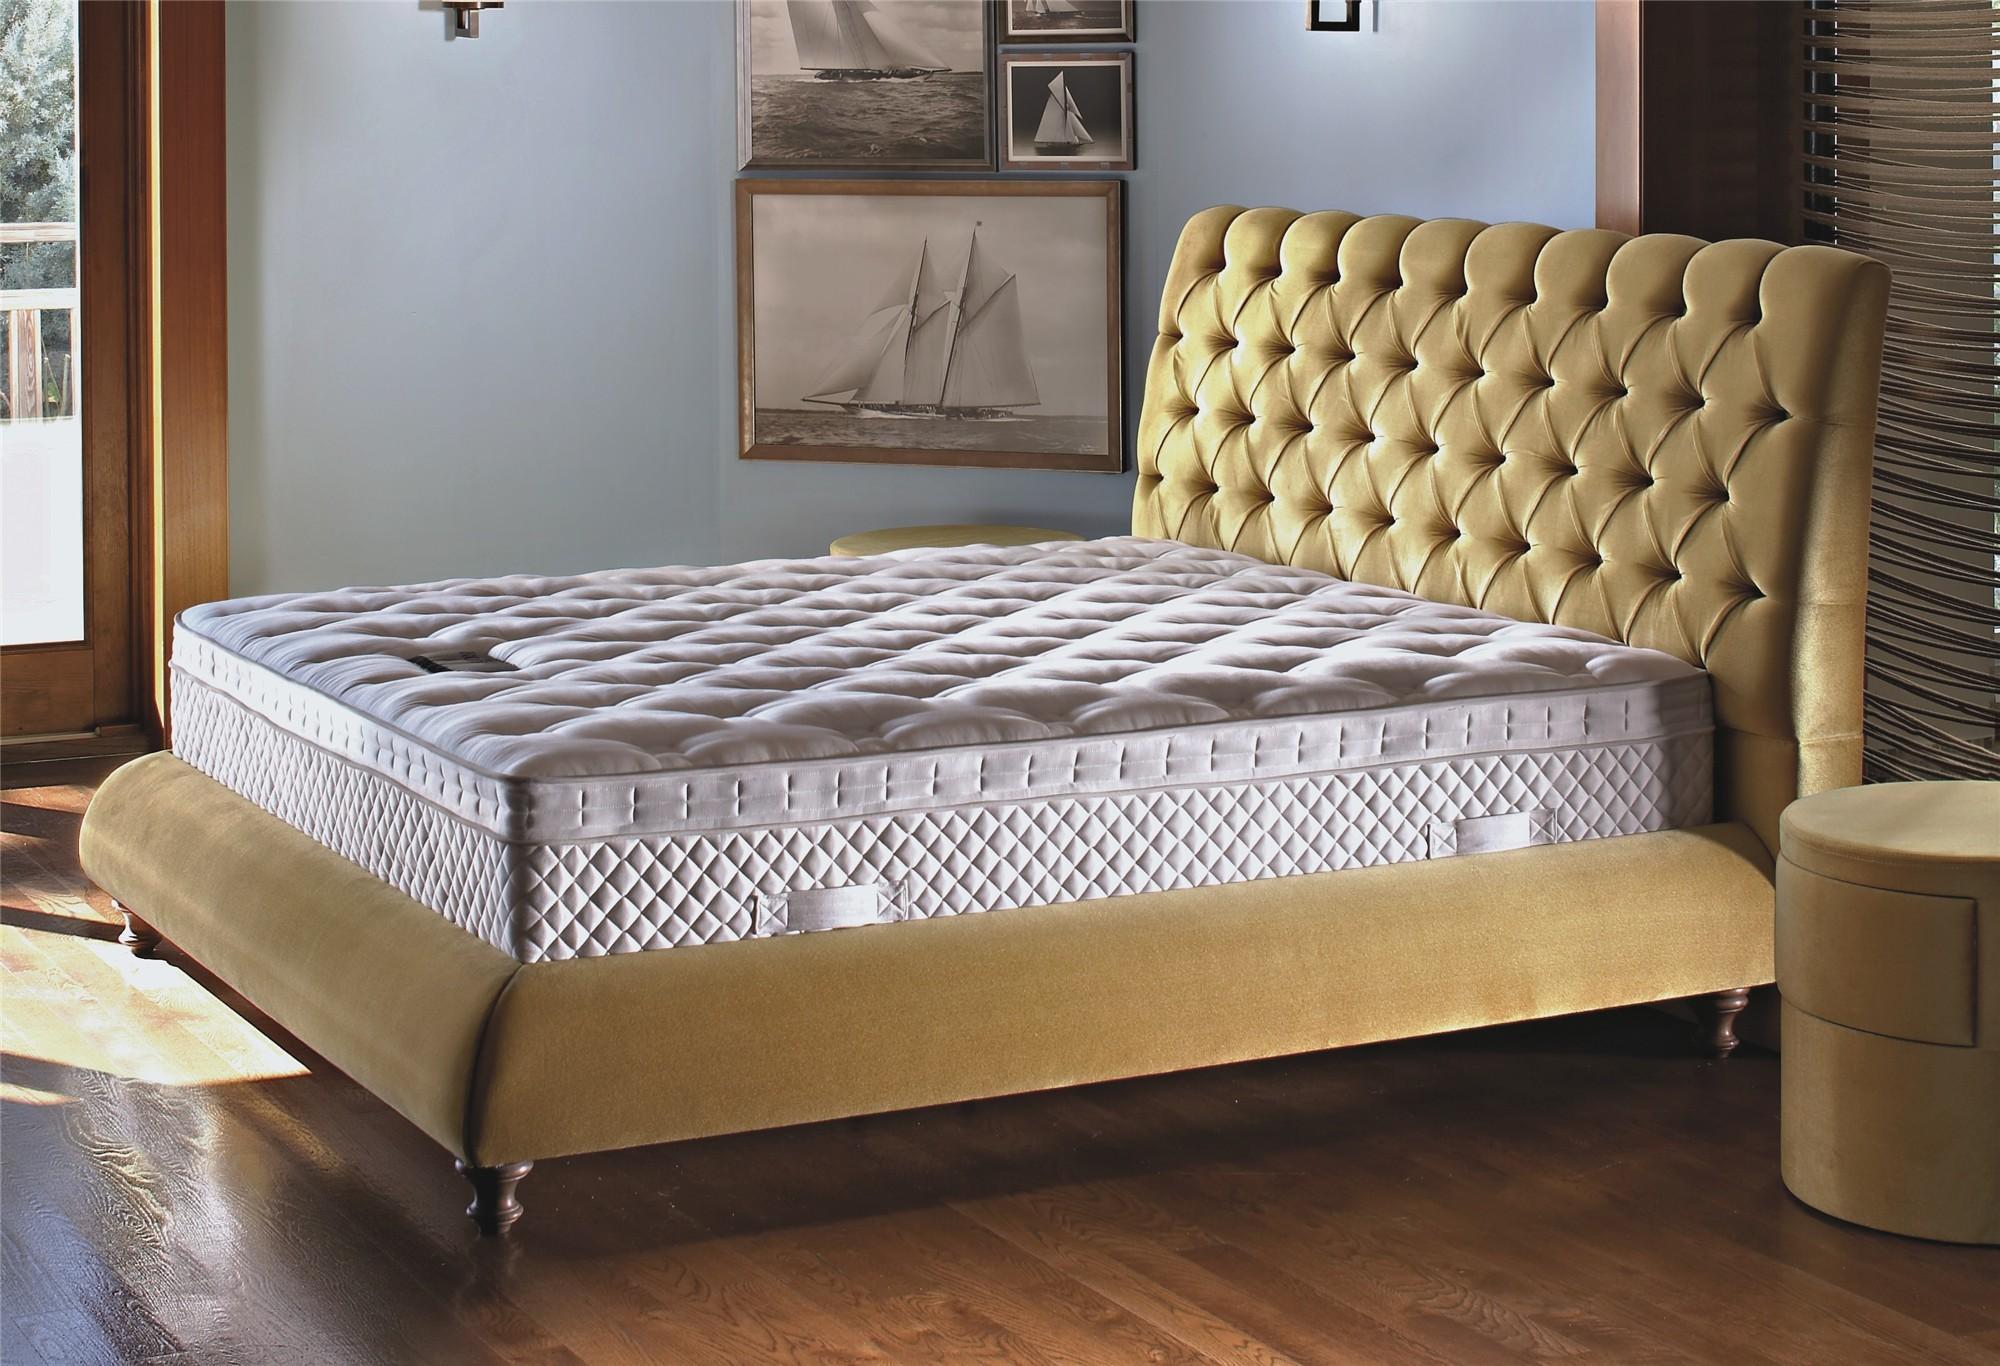 Yatsan Baroness Modern Upholstered Bed Head2bed Uk